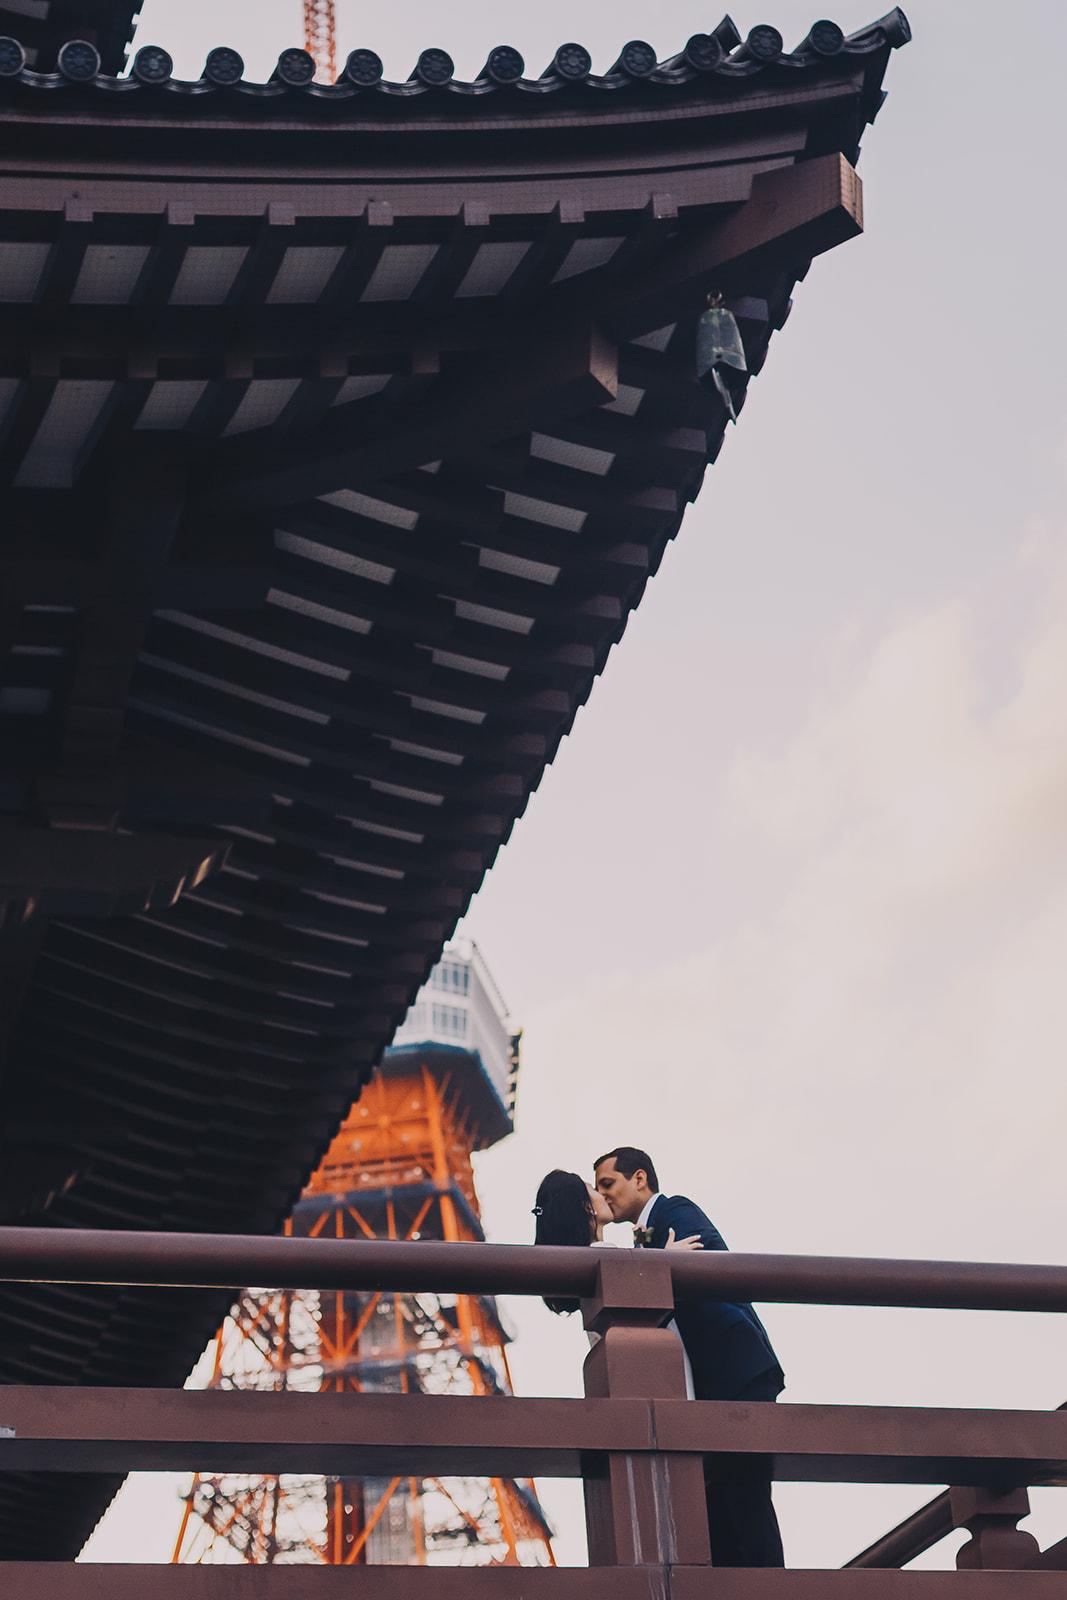 Prewedding pre wedding engagement in Tokyo Japan hire photographer (7).jpg